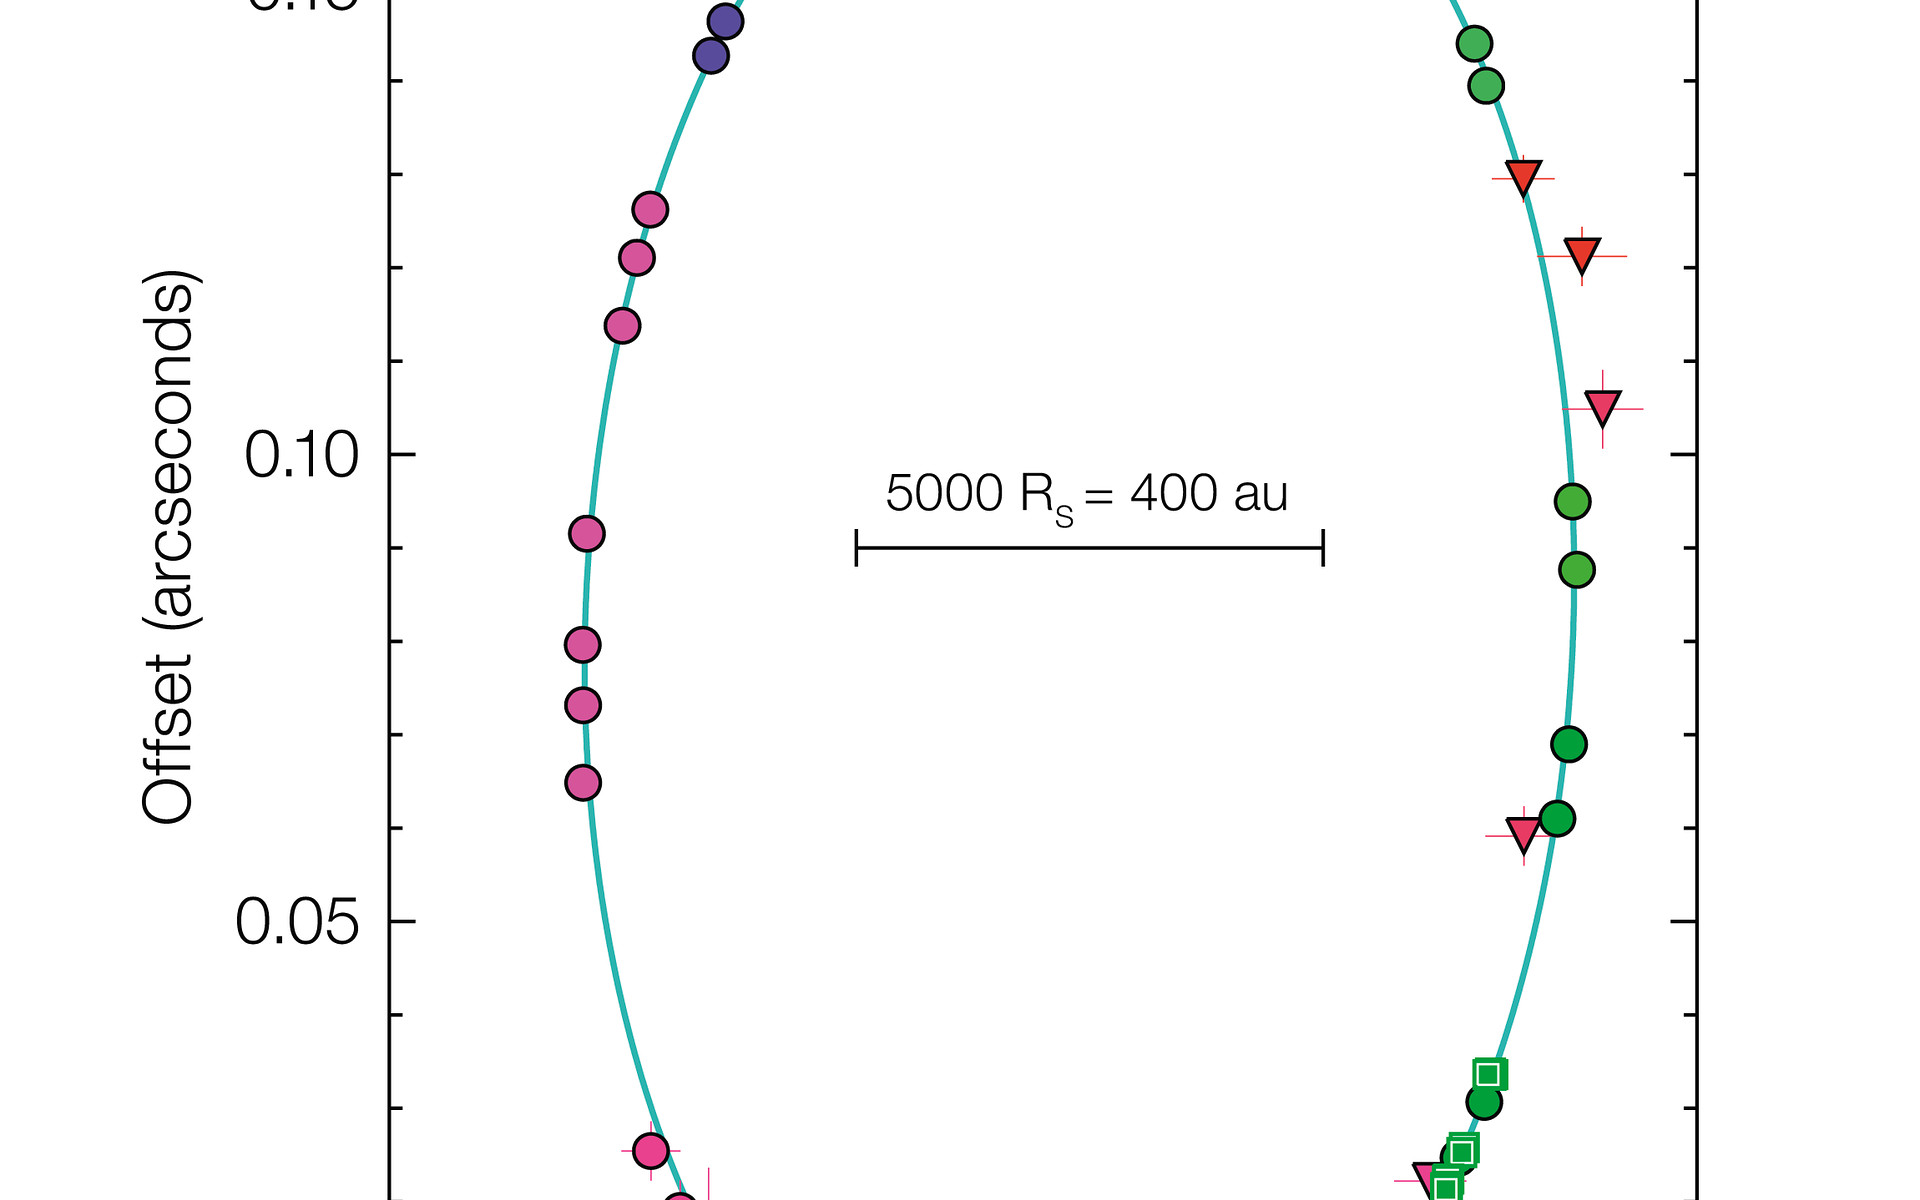 Orbit Diagram Of S2 Around Black Hole At Centre Of The